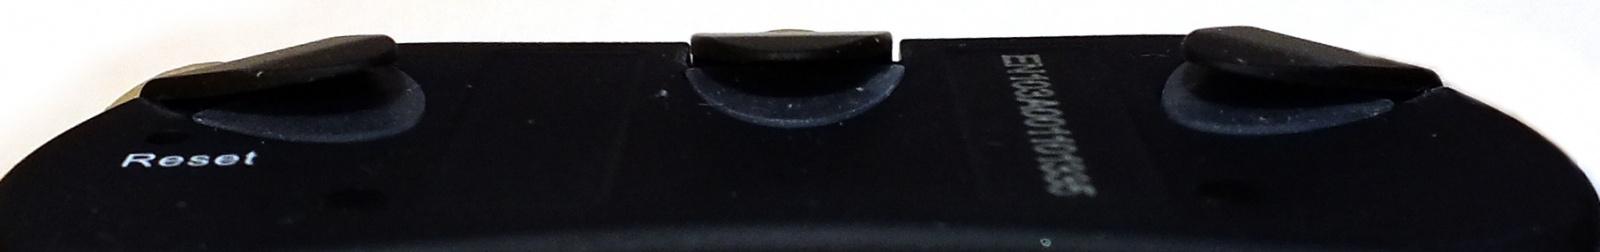 Тест-драйв цифровой ручки Даджет МТ6080 - 2